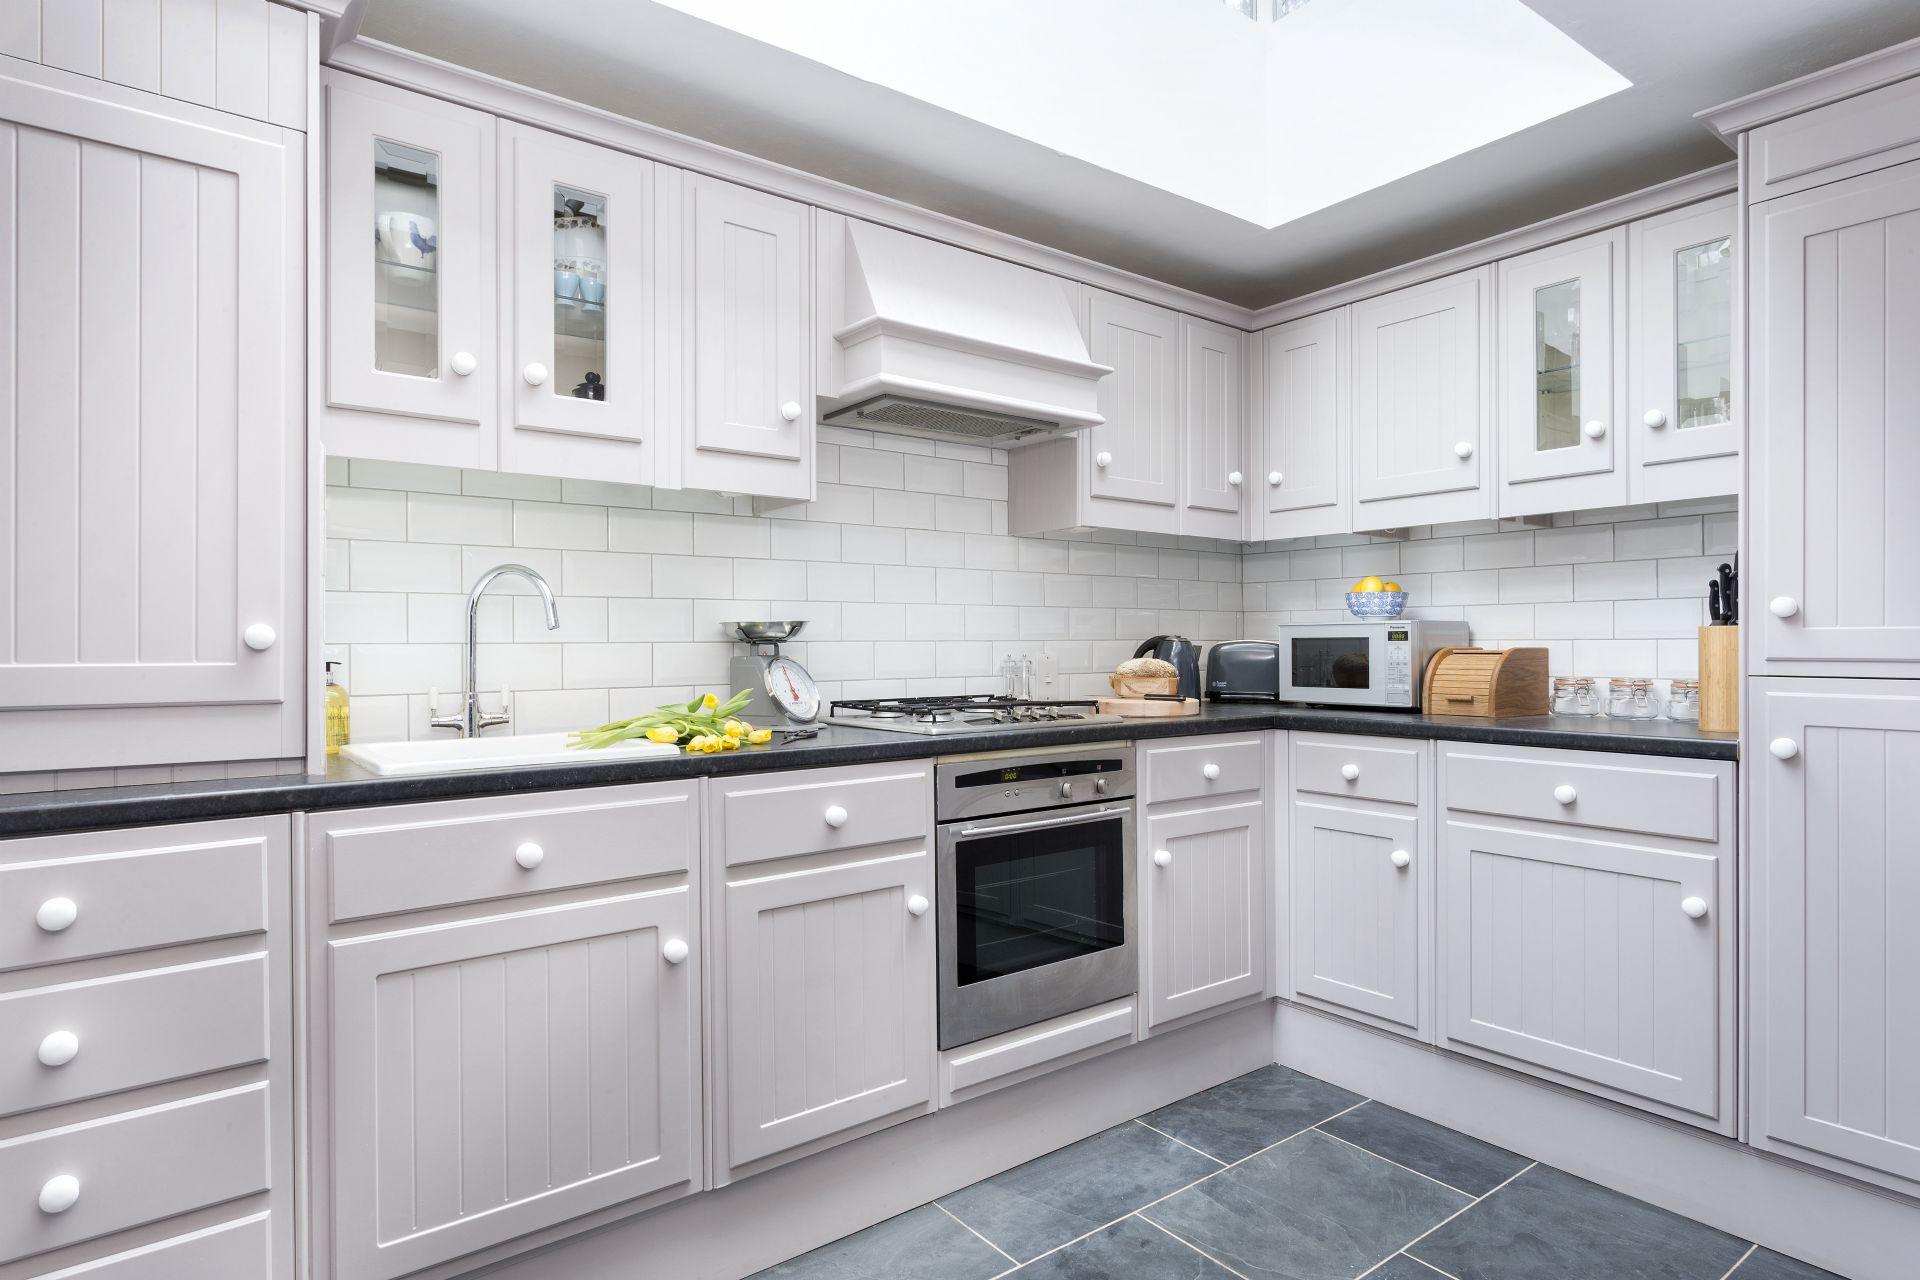 Ground floor: Kitchen with skylight